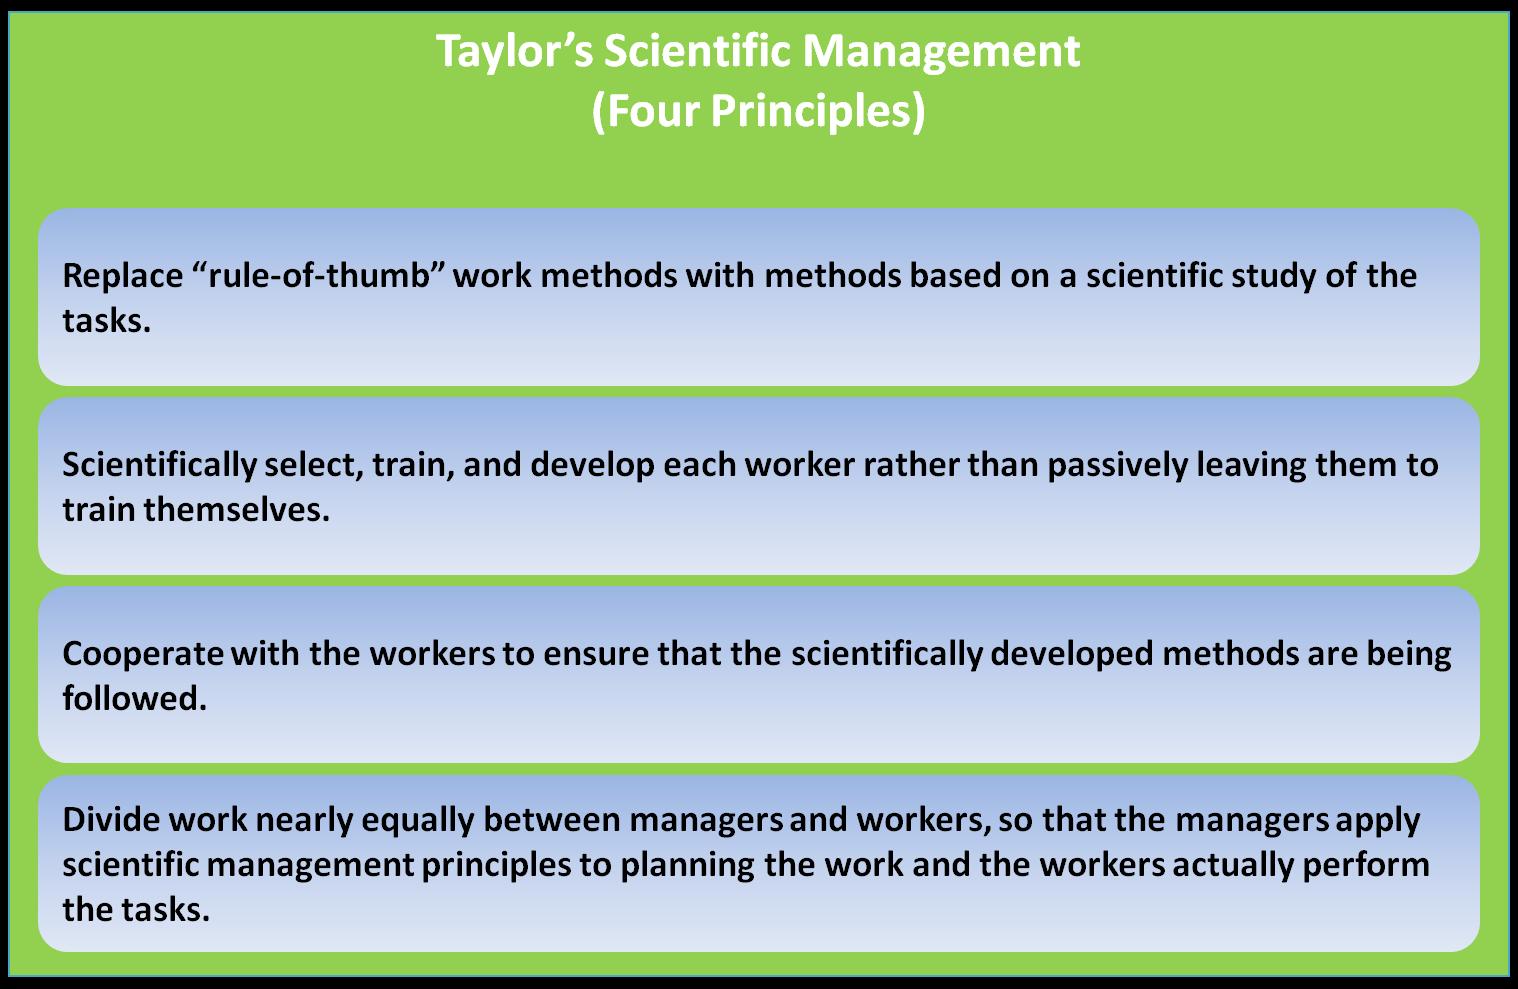 theories of scientific management essay